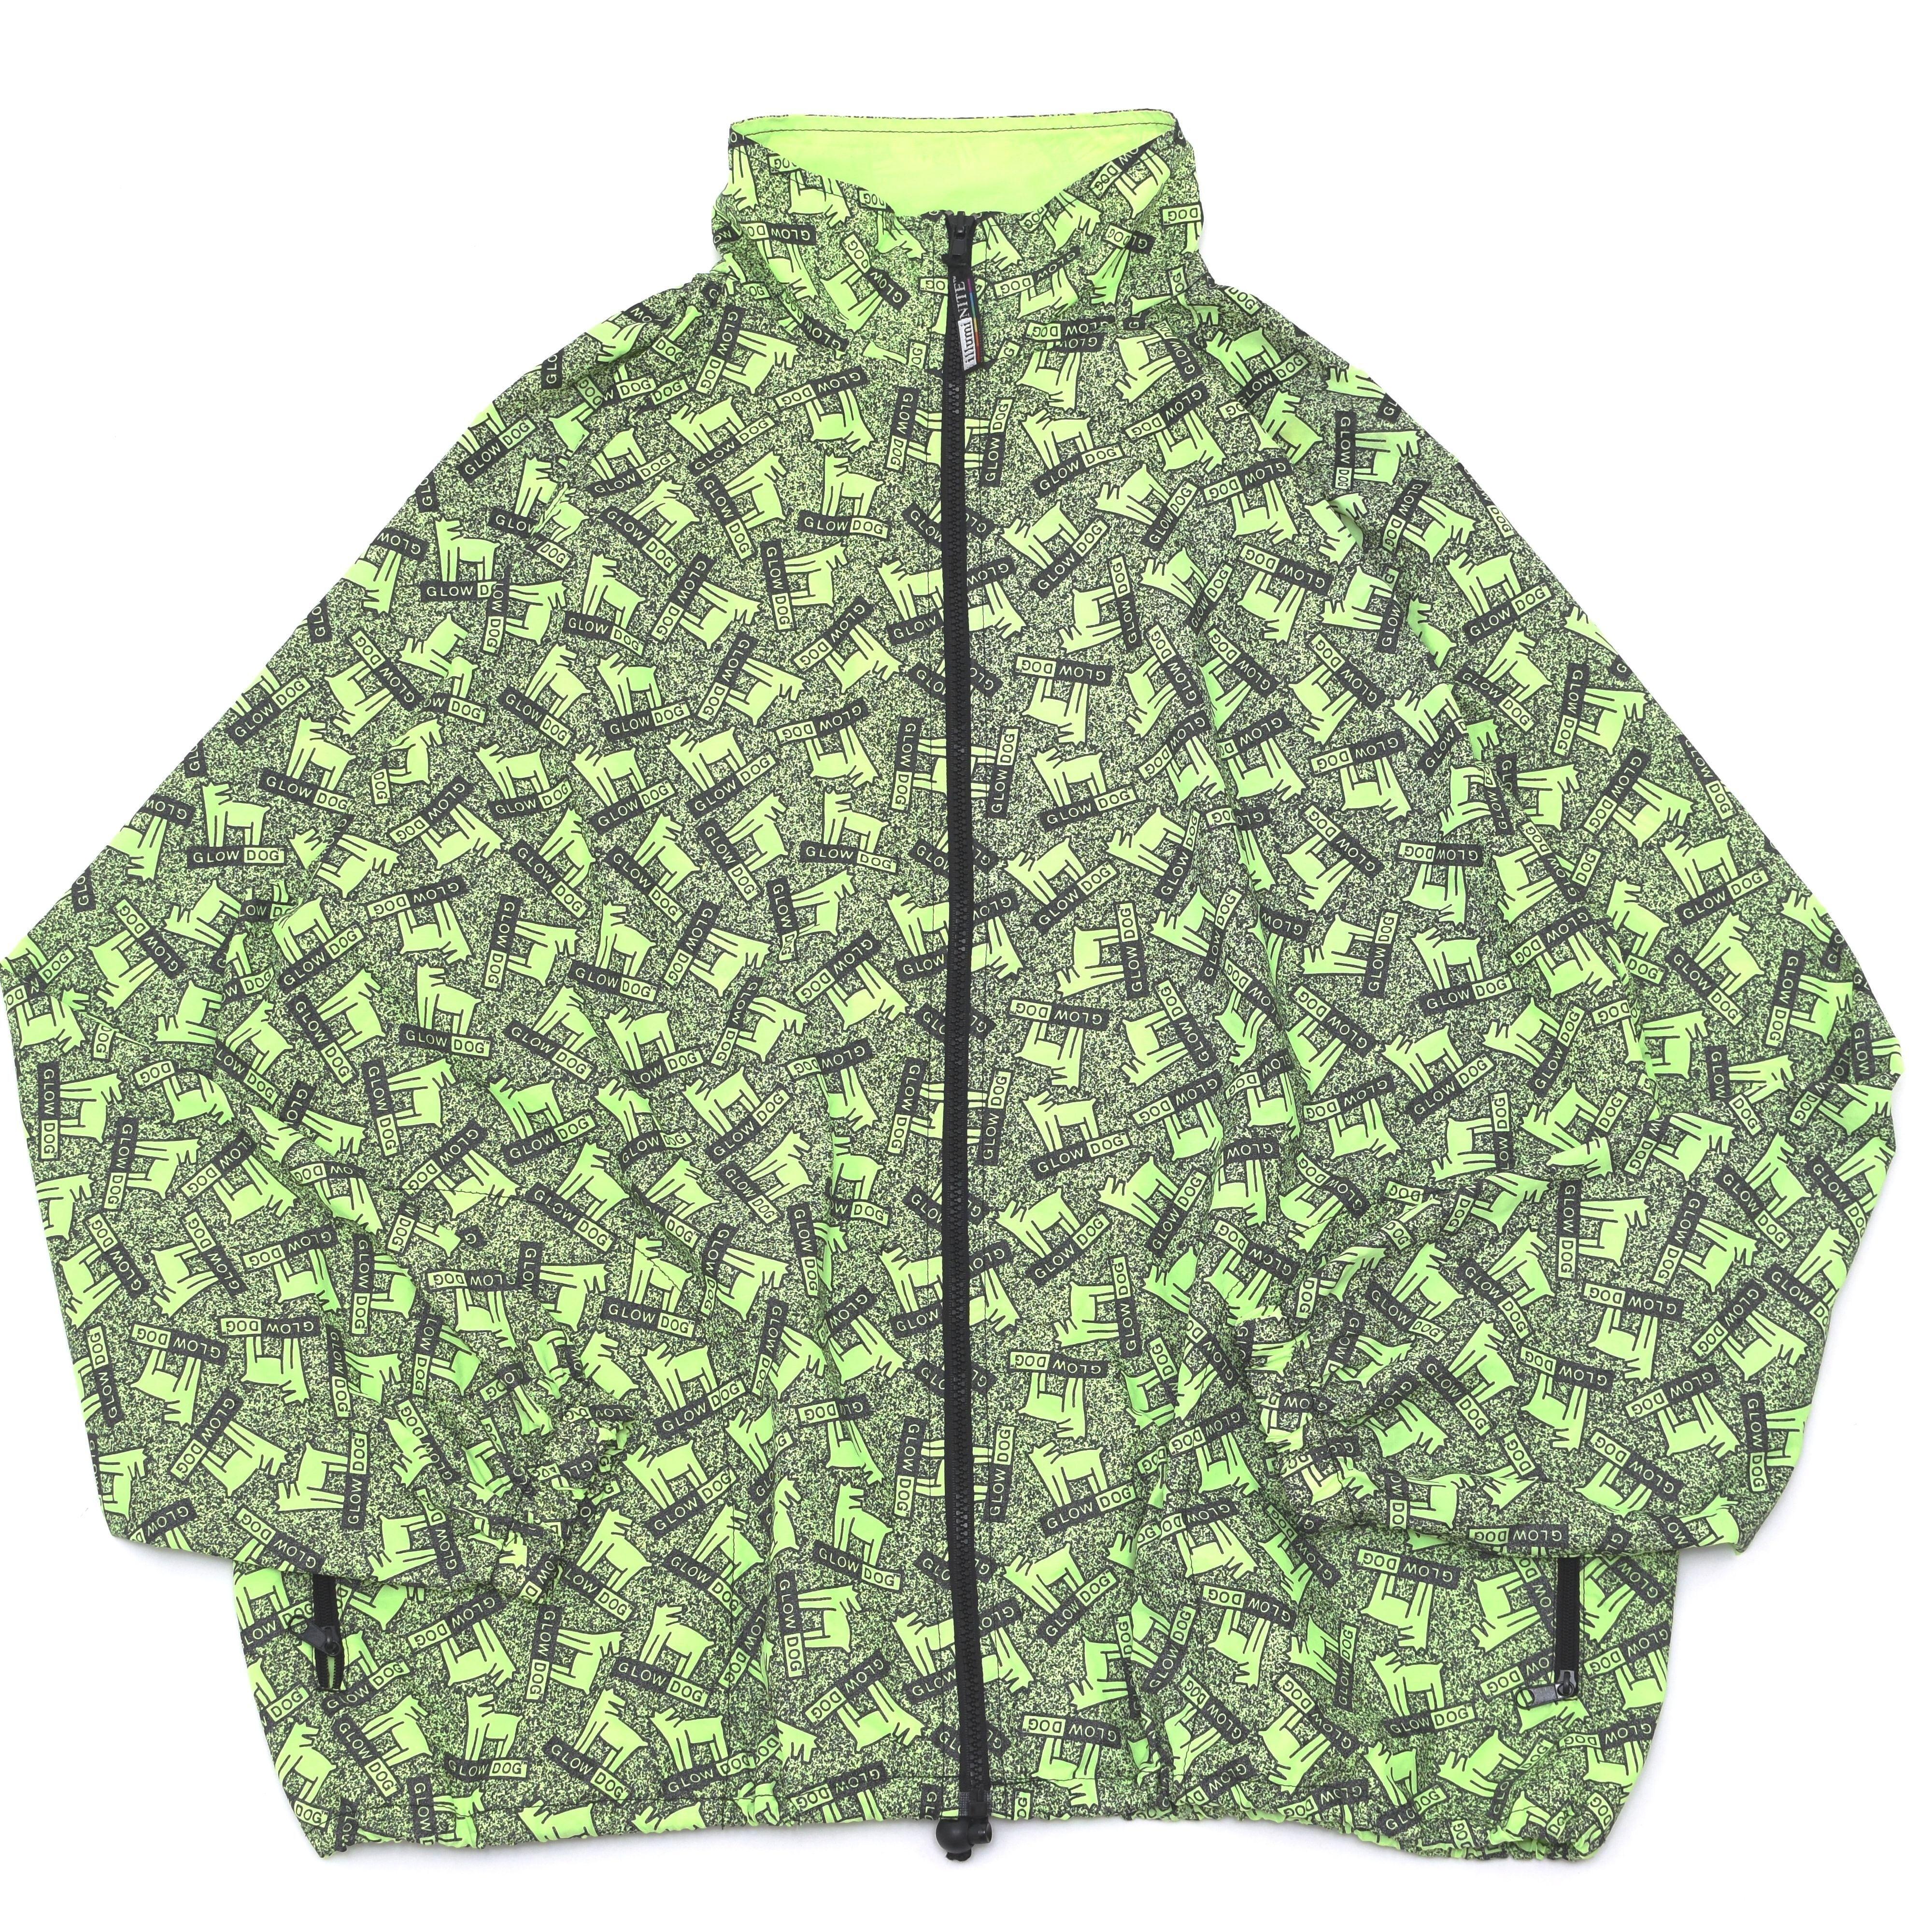 GLOWDOG×illmiNITE allover pattern jacket 総柄 ナイロンジャケット